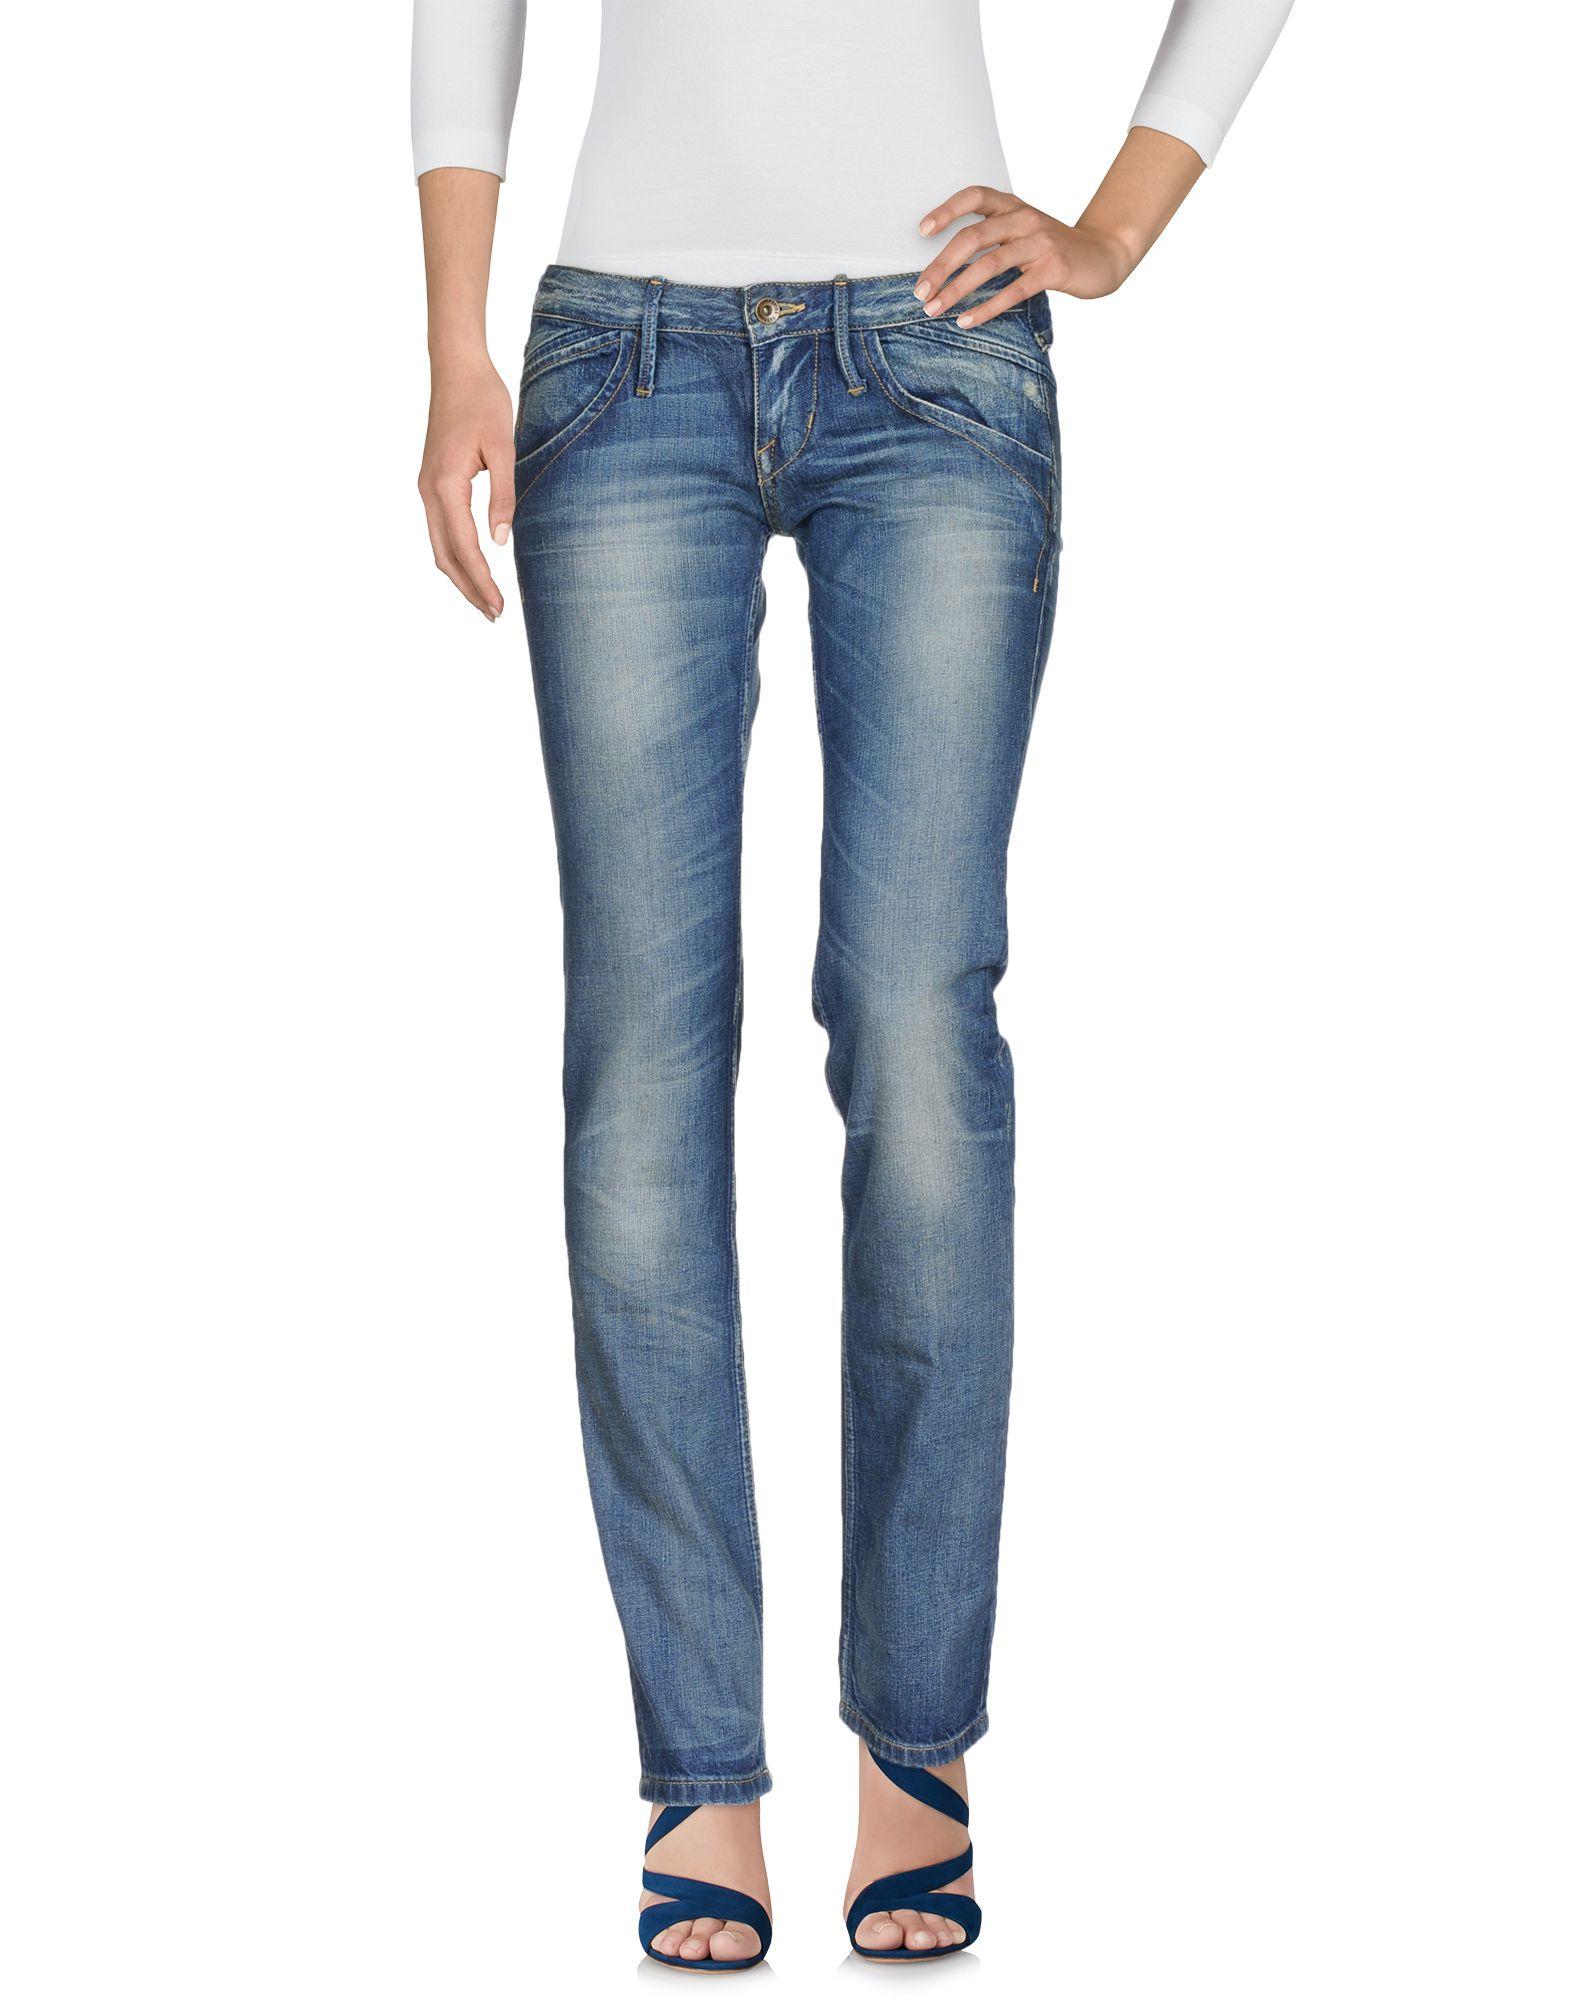 Pantaloni Jeans Fornarina Donna - Acquista online su 88ZRk4B5